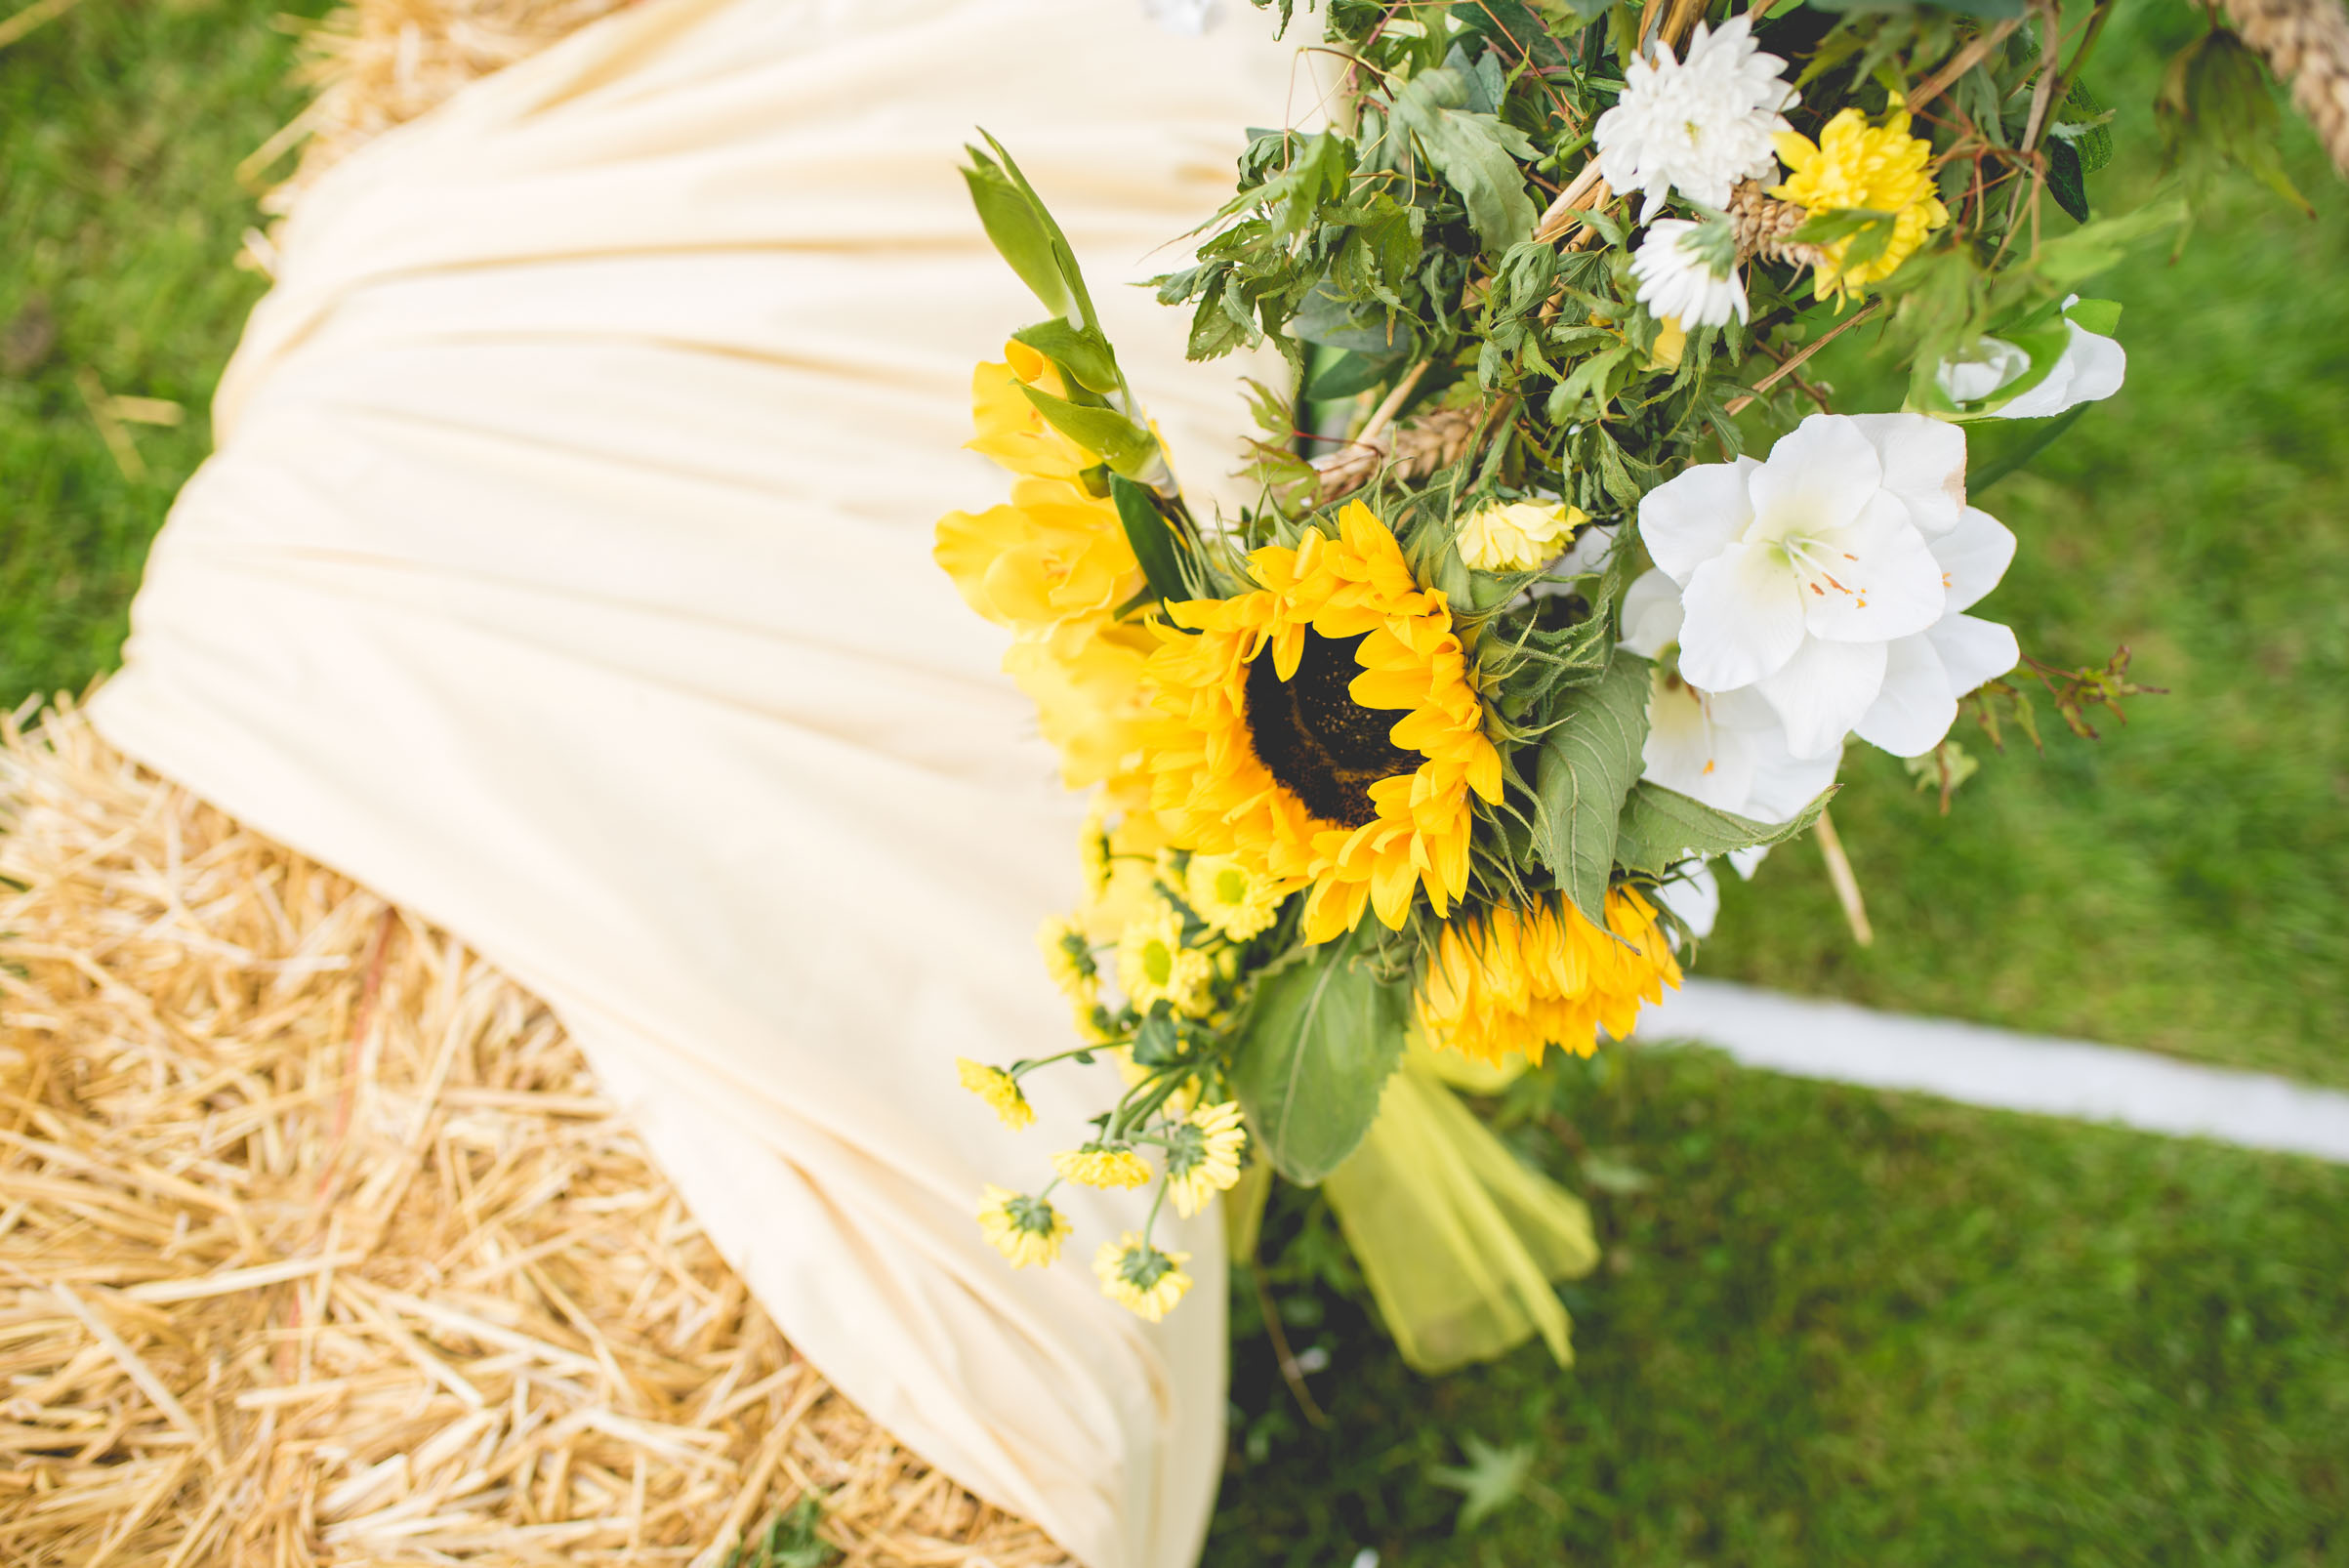 Peak+district+farm+wedding+lower+damgate+photographer-109.jpg